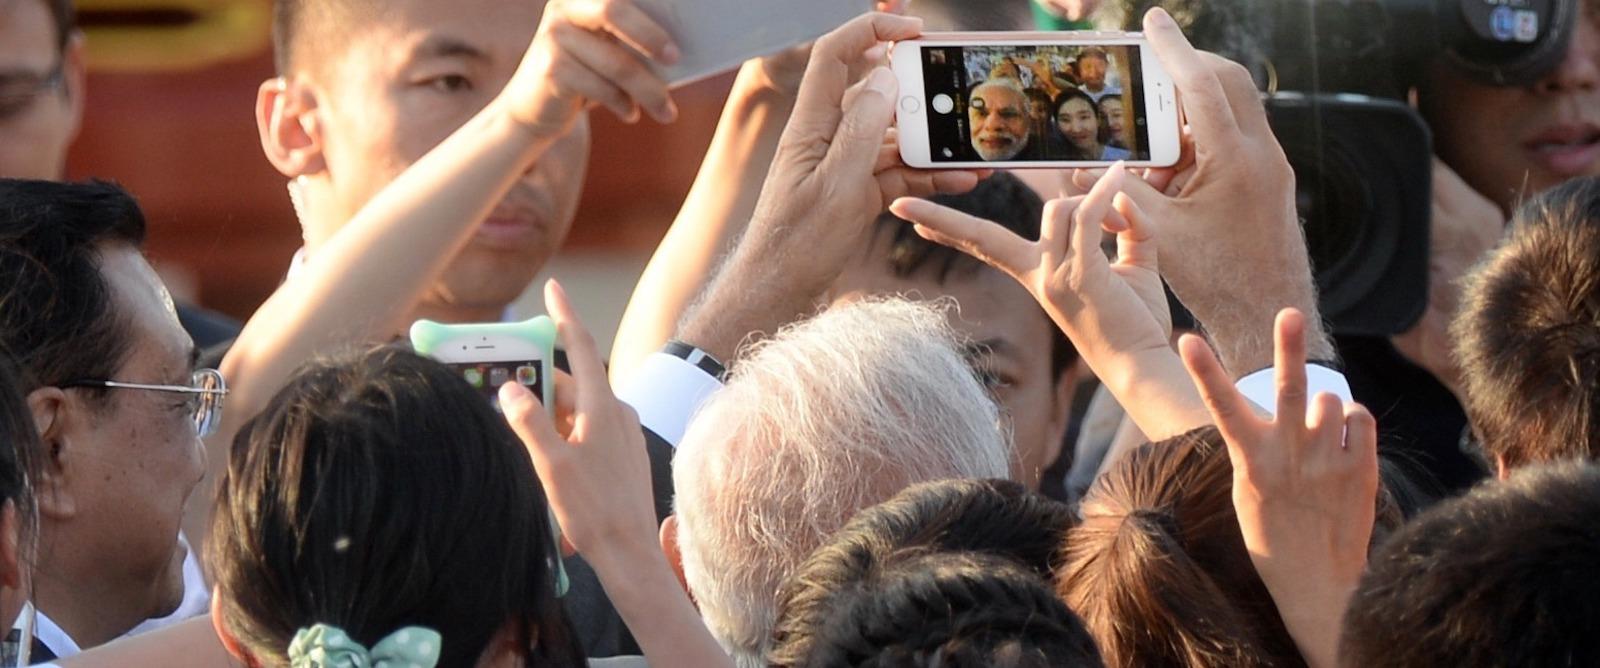 Modi's use of social media is revolutionary (Photo: Kenzaburo Fukuhara via Getty)